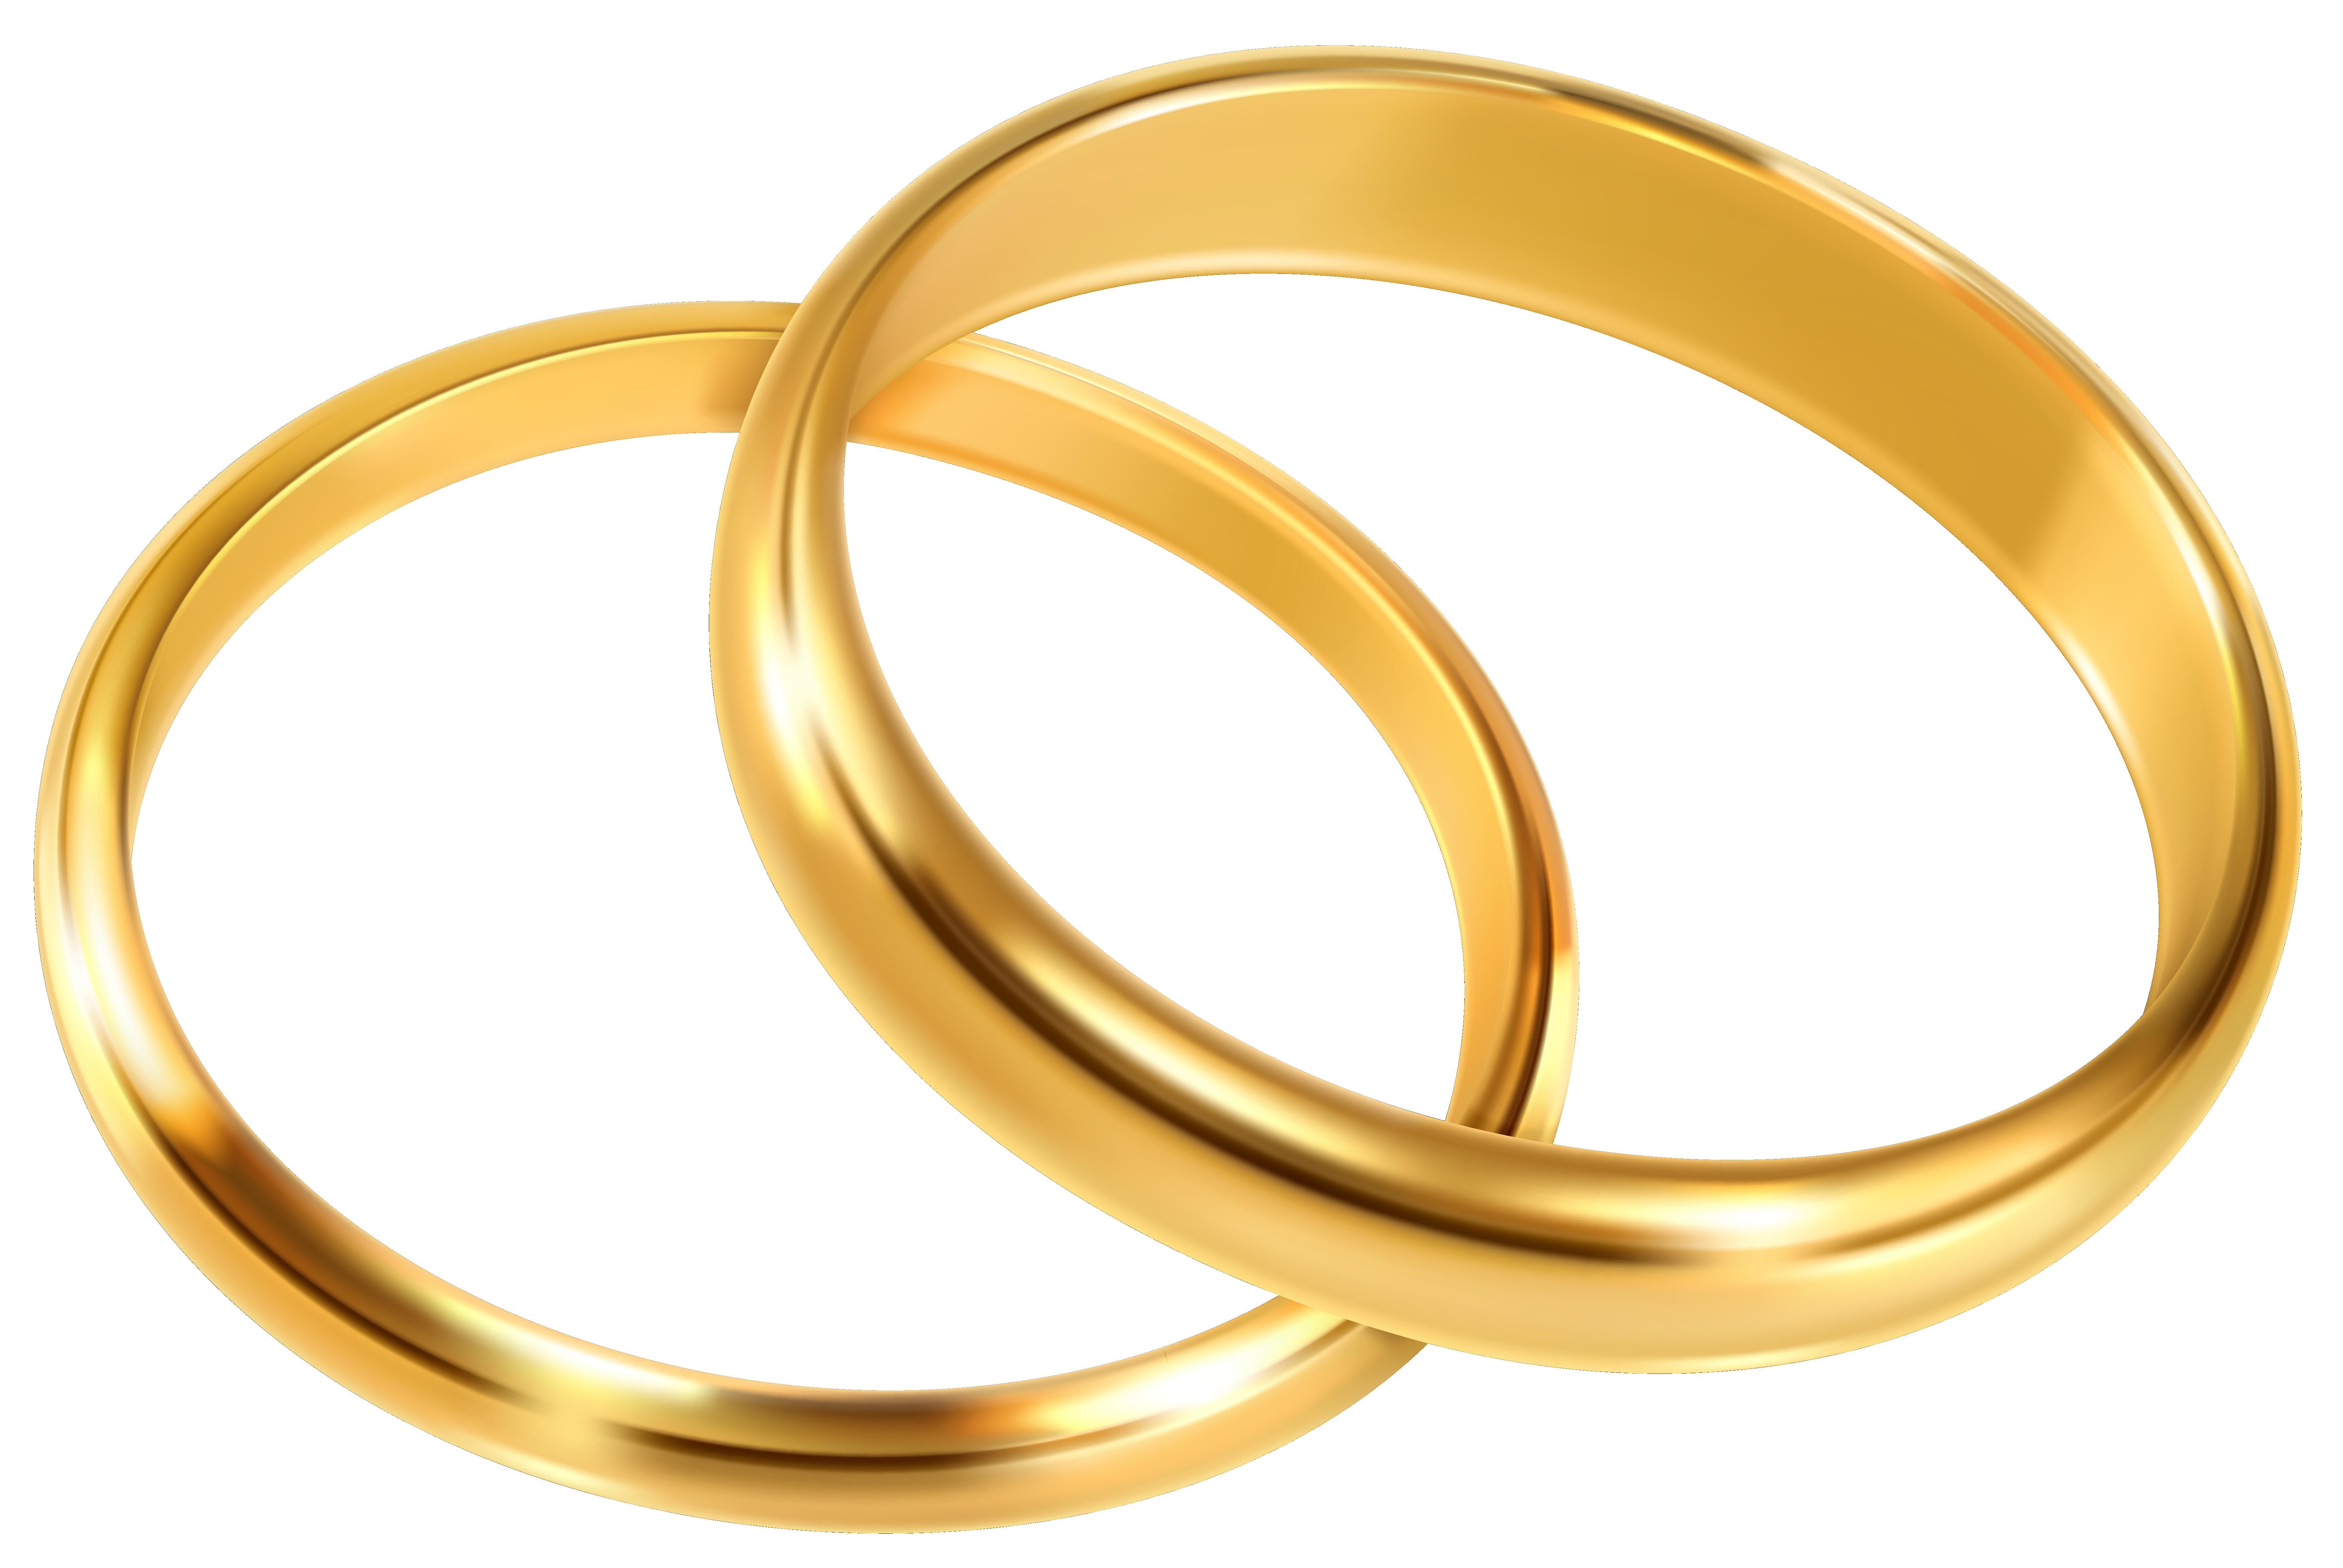 Wedding Rings PNG Clip Art Image.